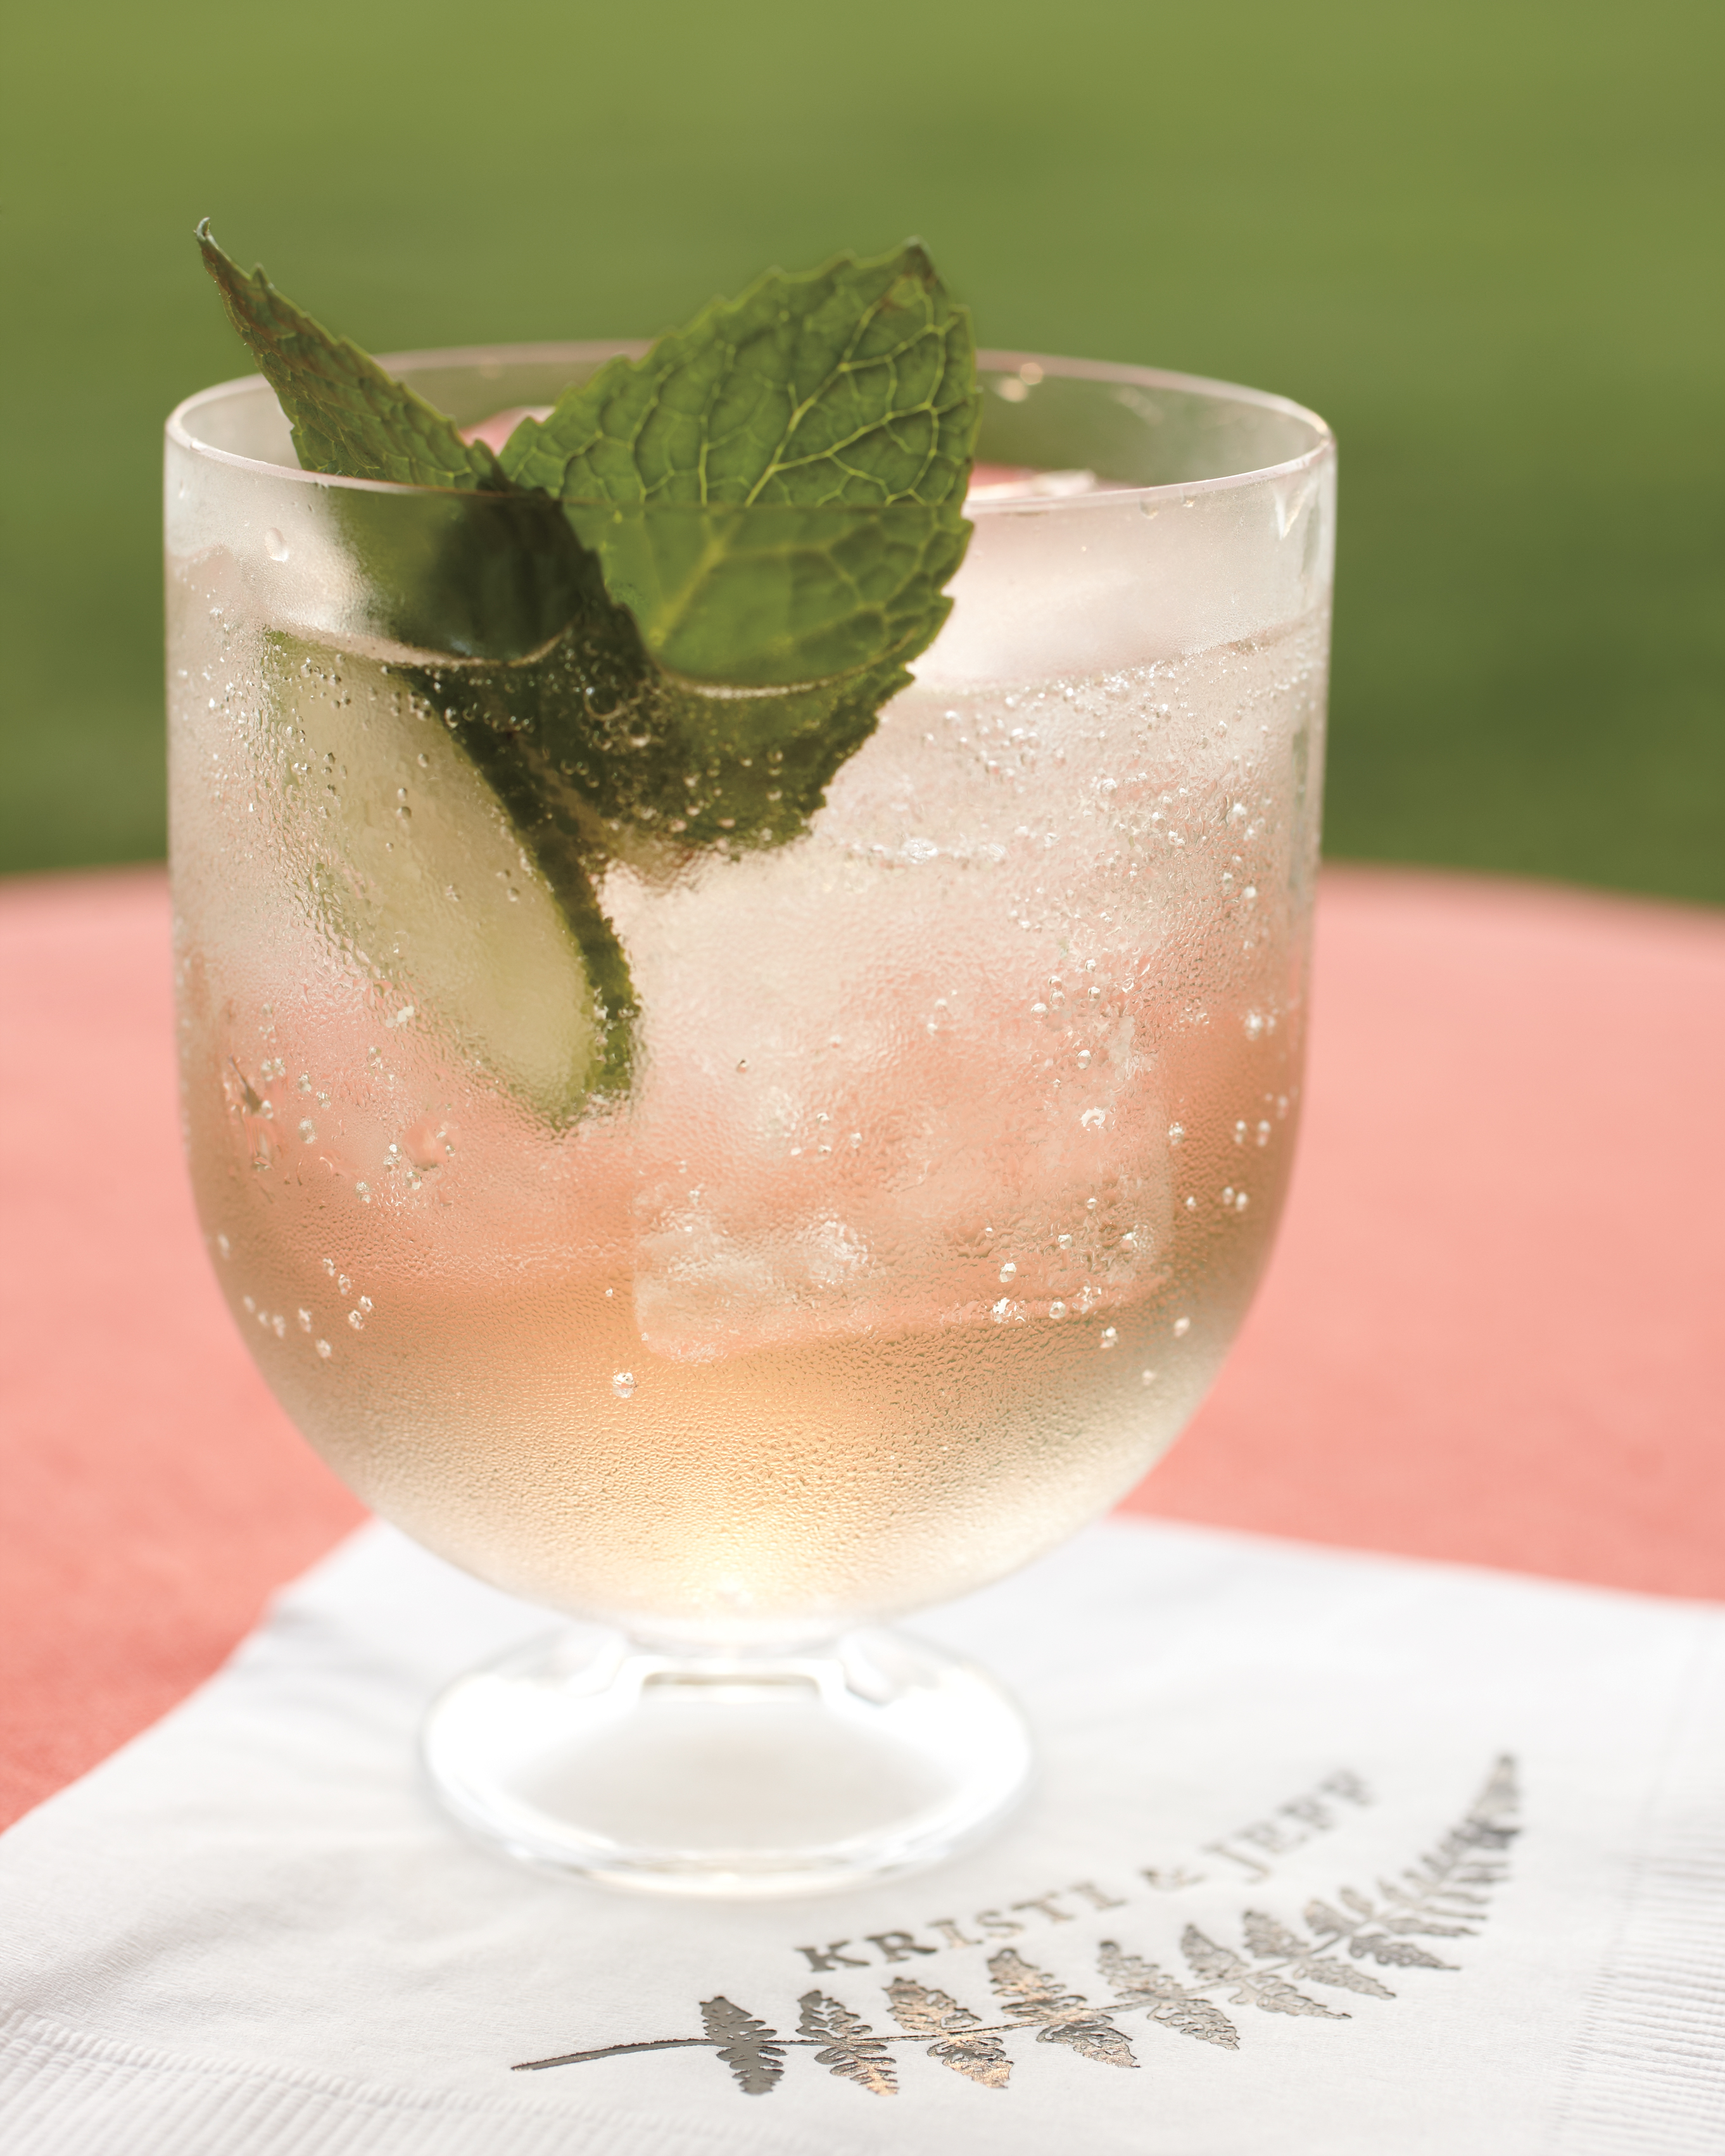 cocktail-16-mwd109382.jpg